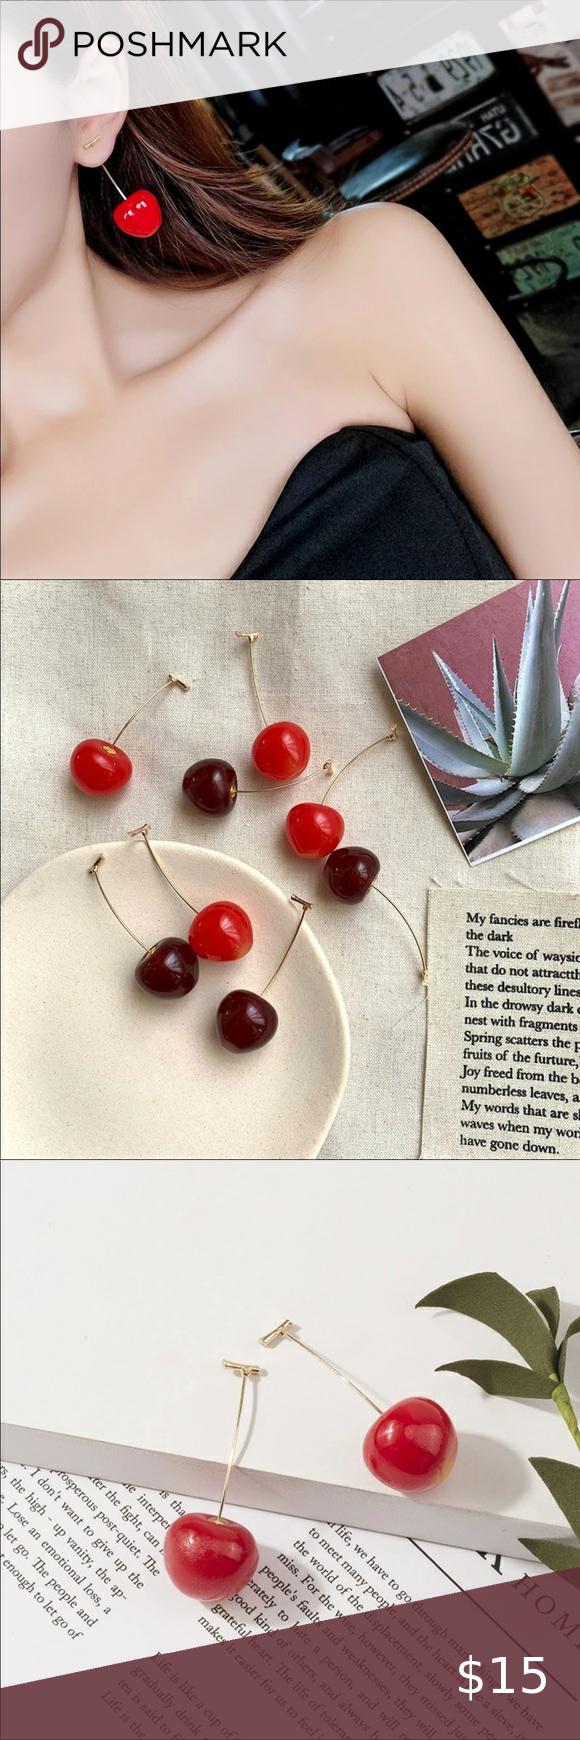 3 30 Fun Fruit Red Cherry Earrings Brand New Boutique Item Fun Dark Red Cherry Earrings And Bright Red Cherry In 2020 Cherry Earrings Best Fruits Fruit Earrings